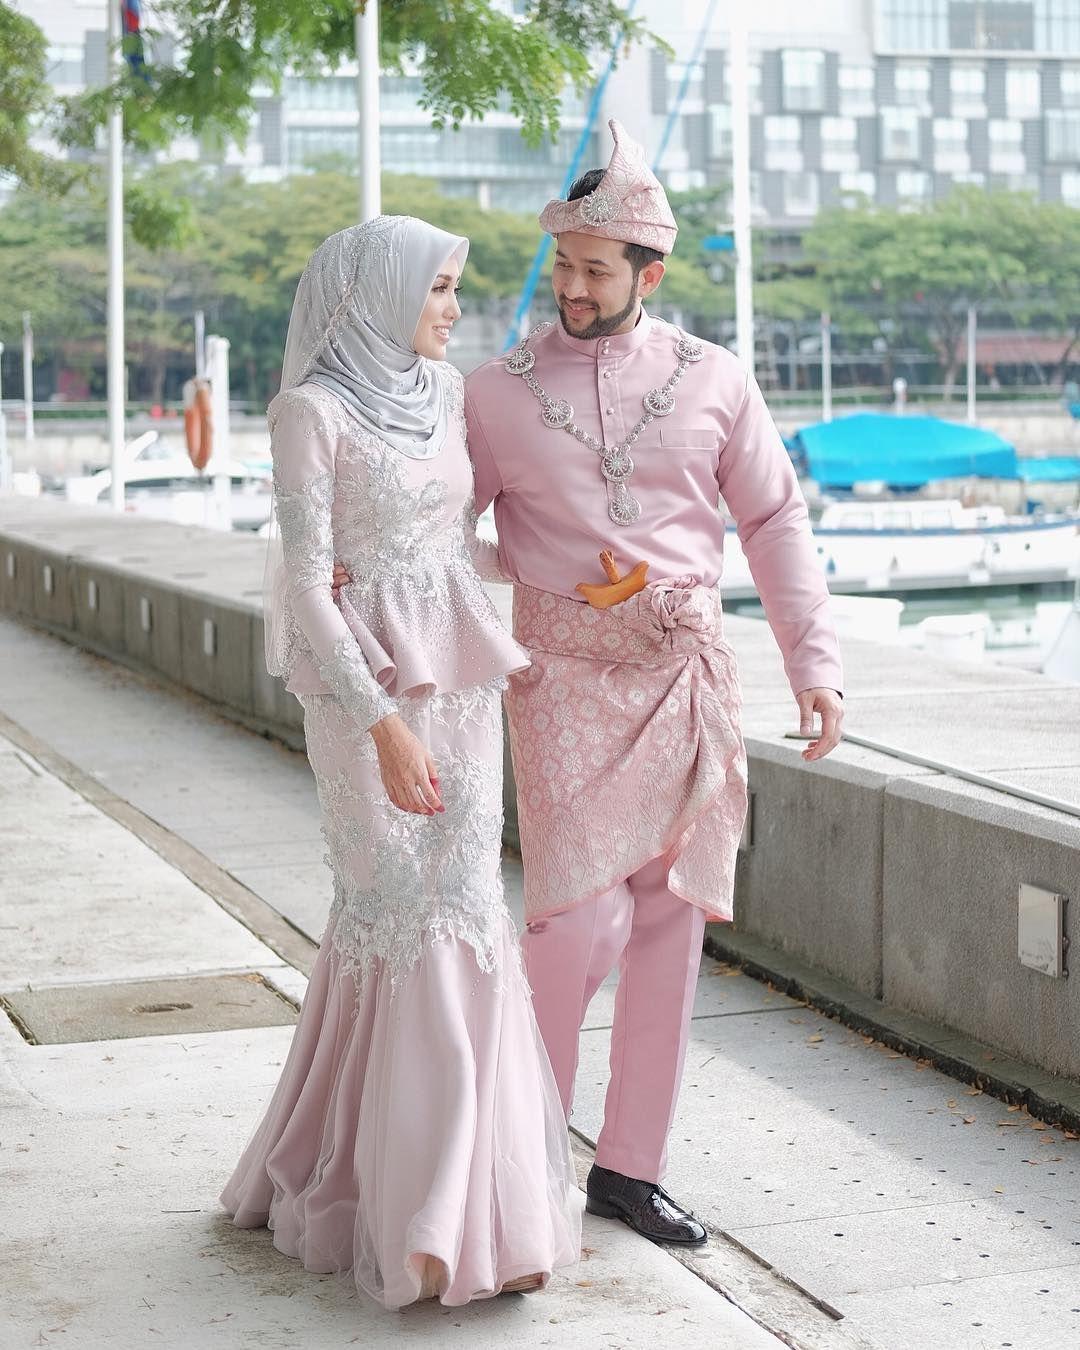 Gambar Berdua Pulaklah  F F   Thank You Terusikevent Buatkan Baju Melayu Full Set Untuk Shuben